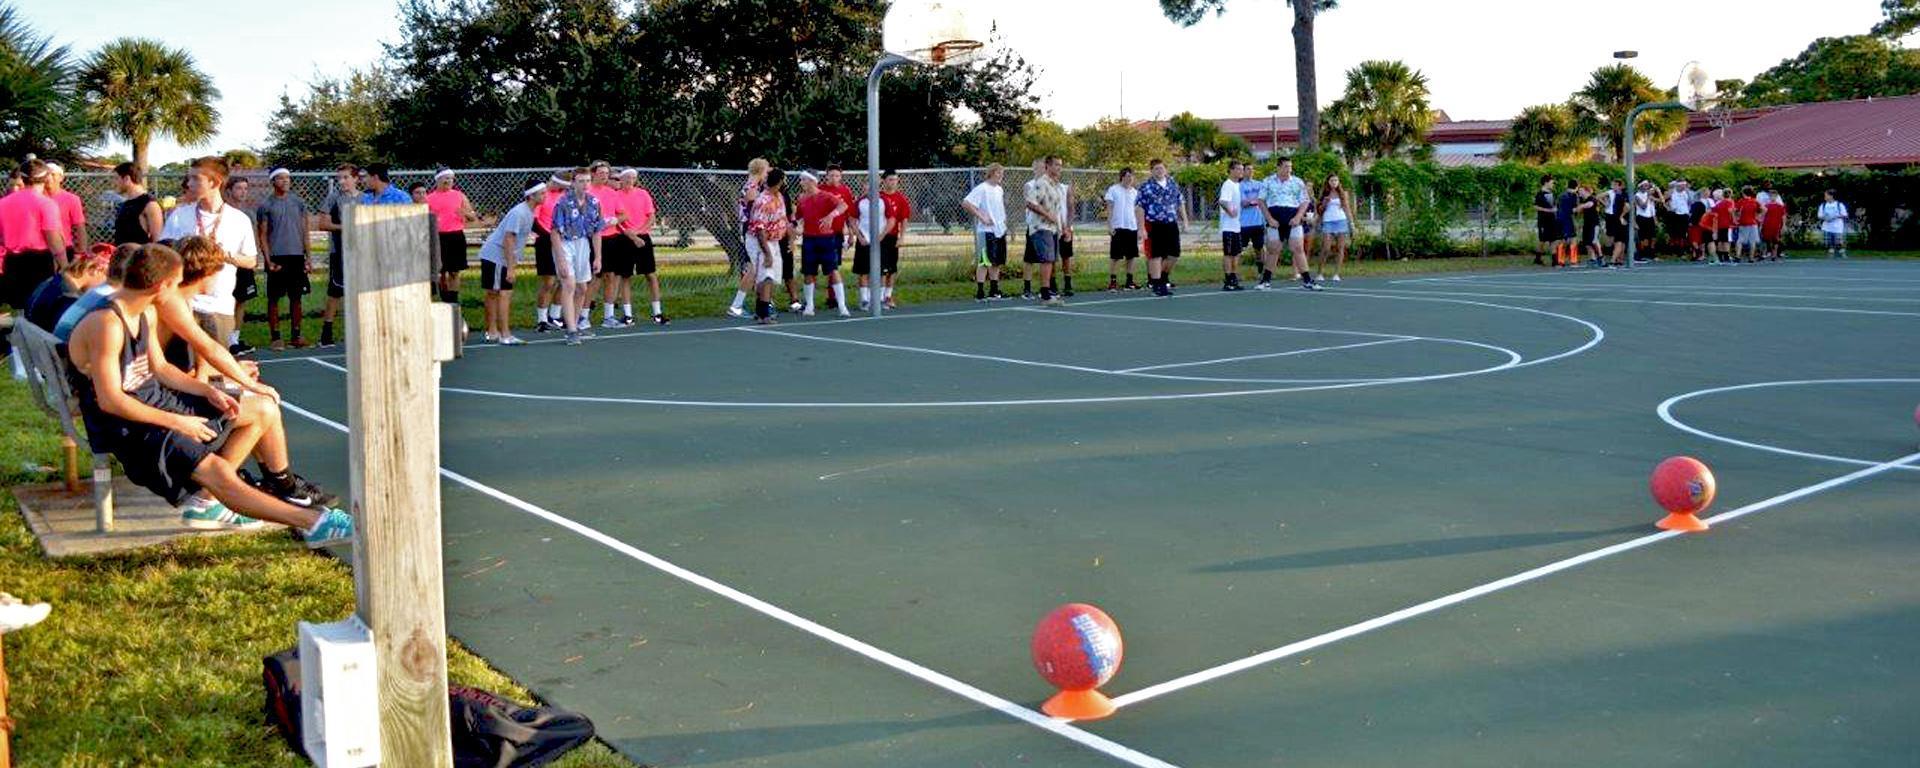 Dodgeball tournament for teens.